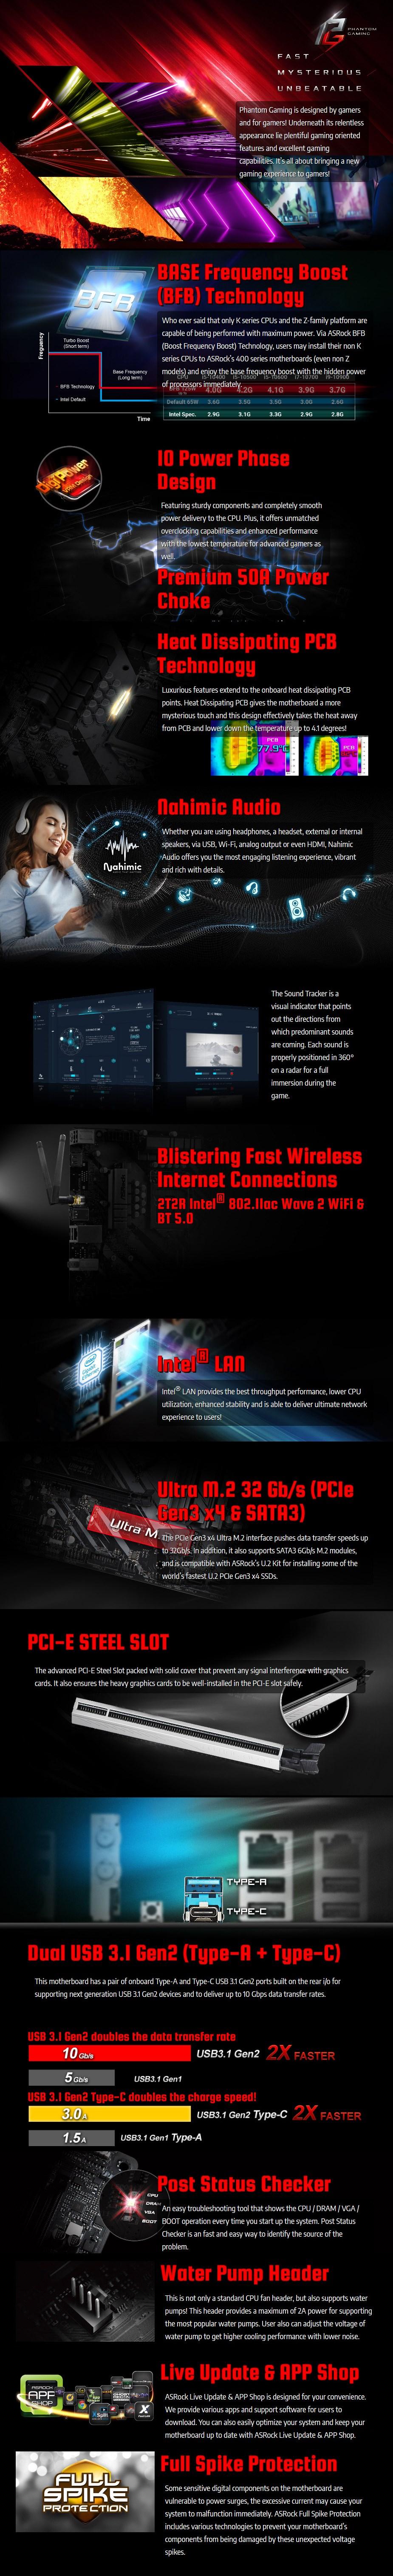 asrock-z490-phantom-gaming-4ac-lga-1200-atx-motherboard-ac34588-9.jpg